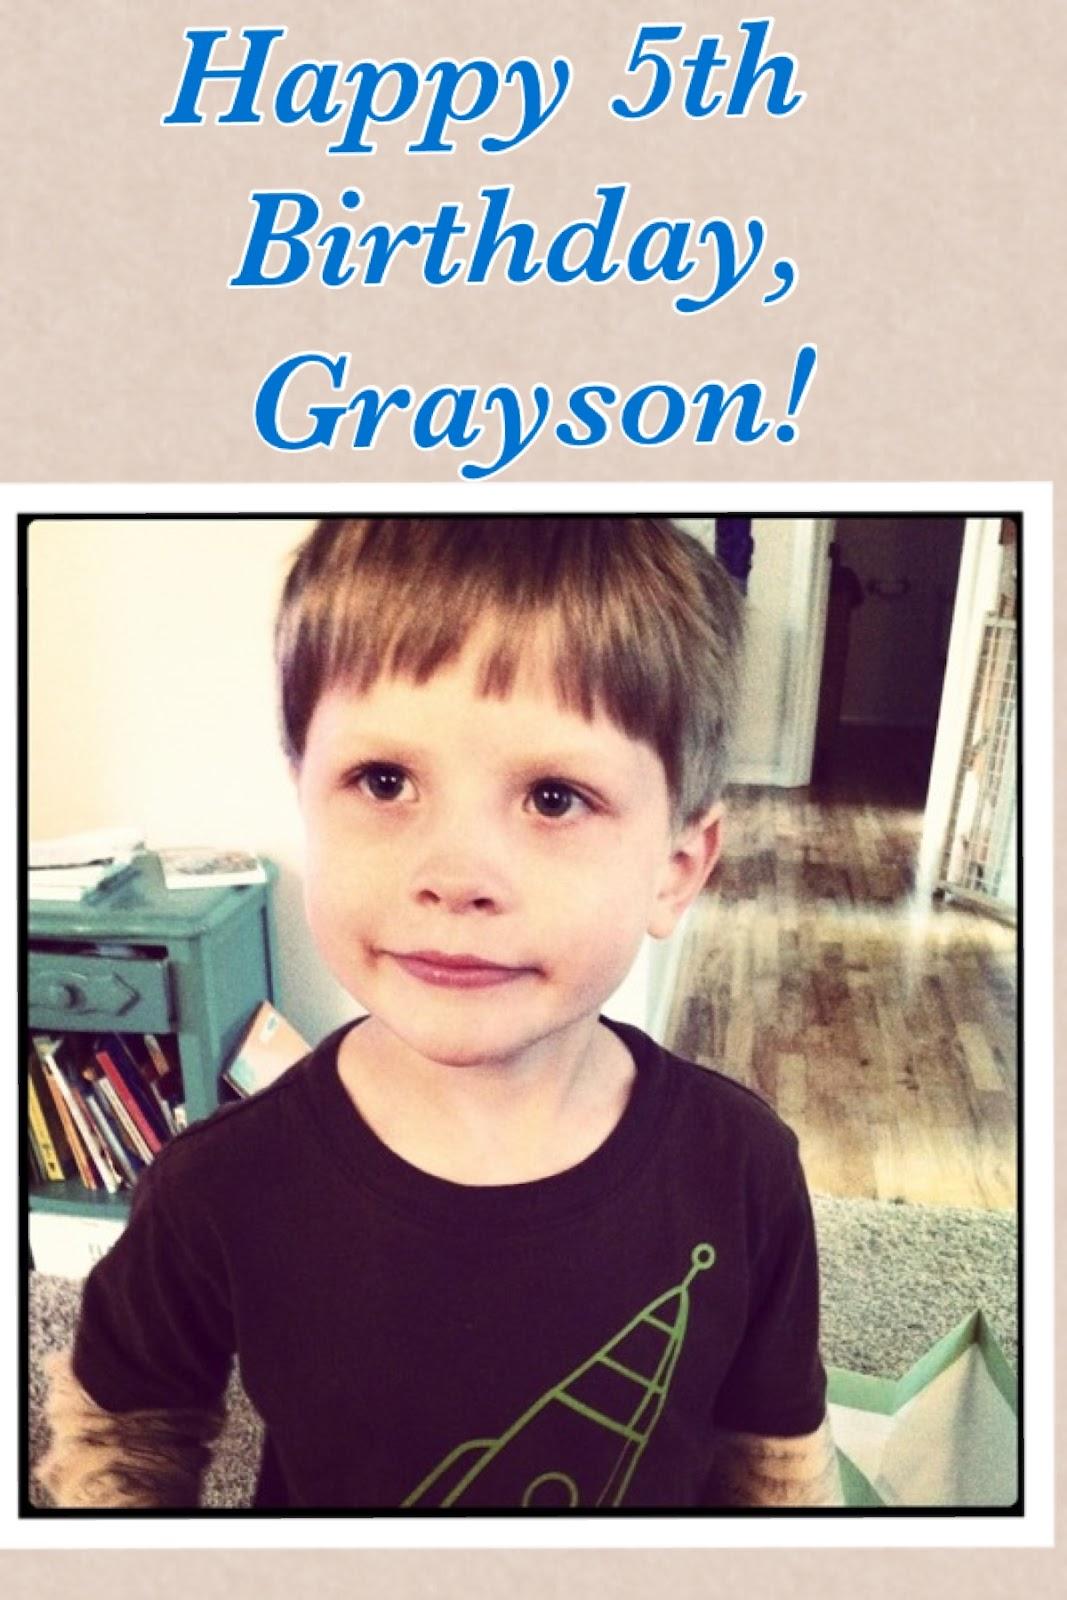 Our Family News: Happy 5th Birthday, Grayson